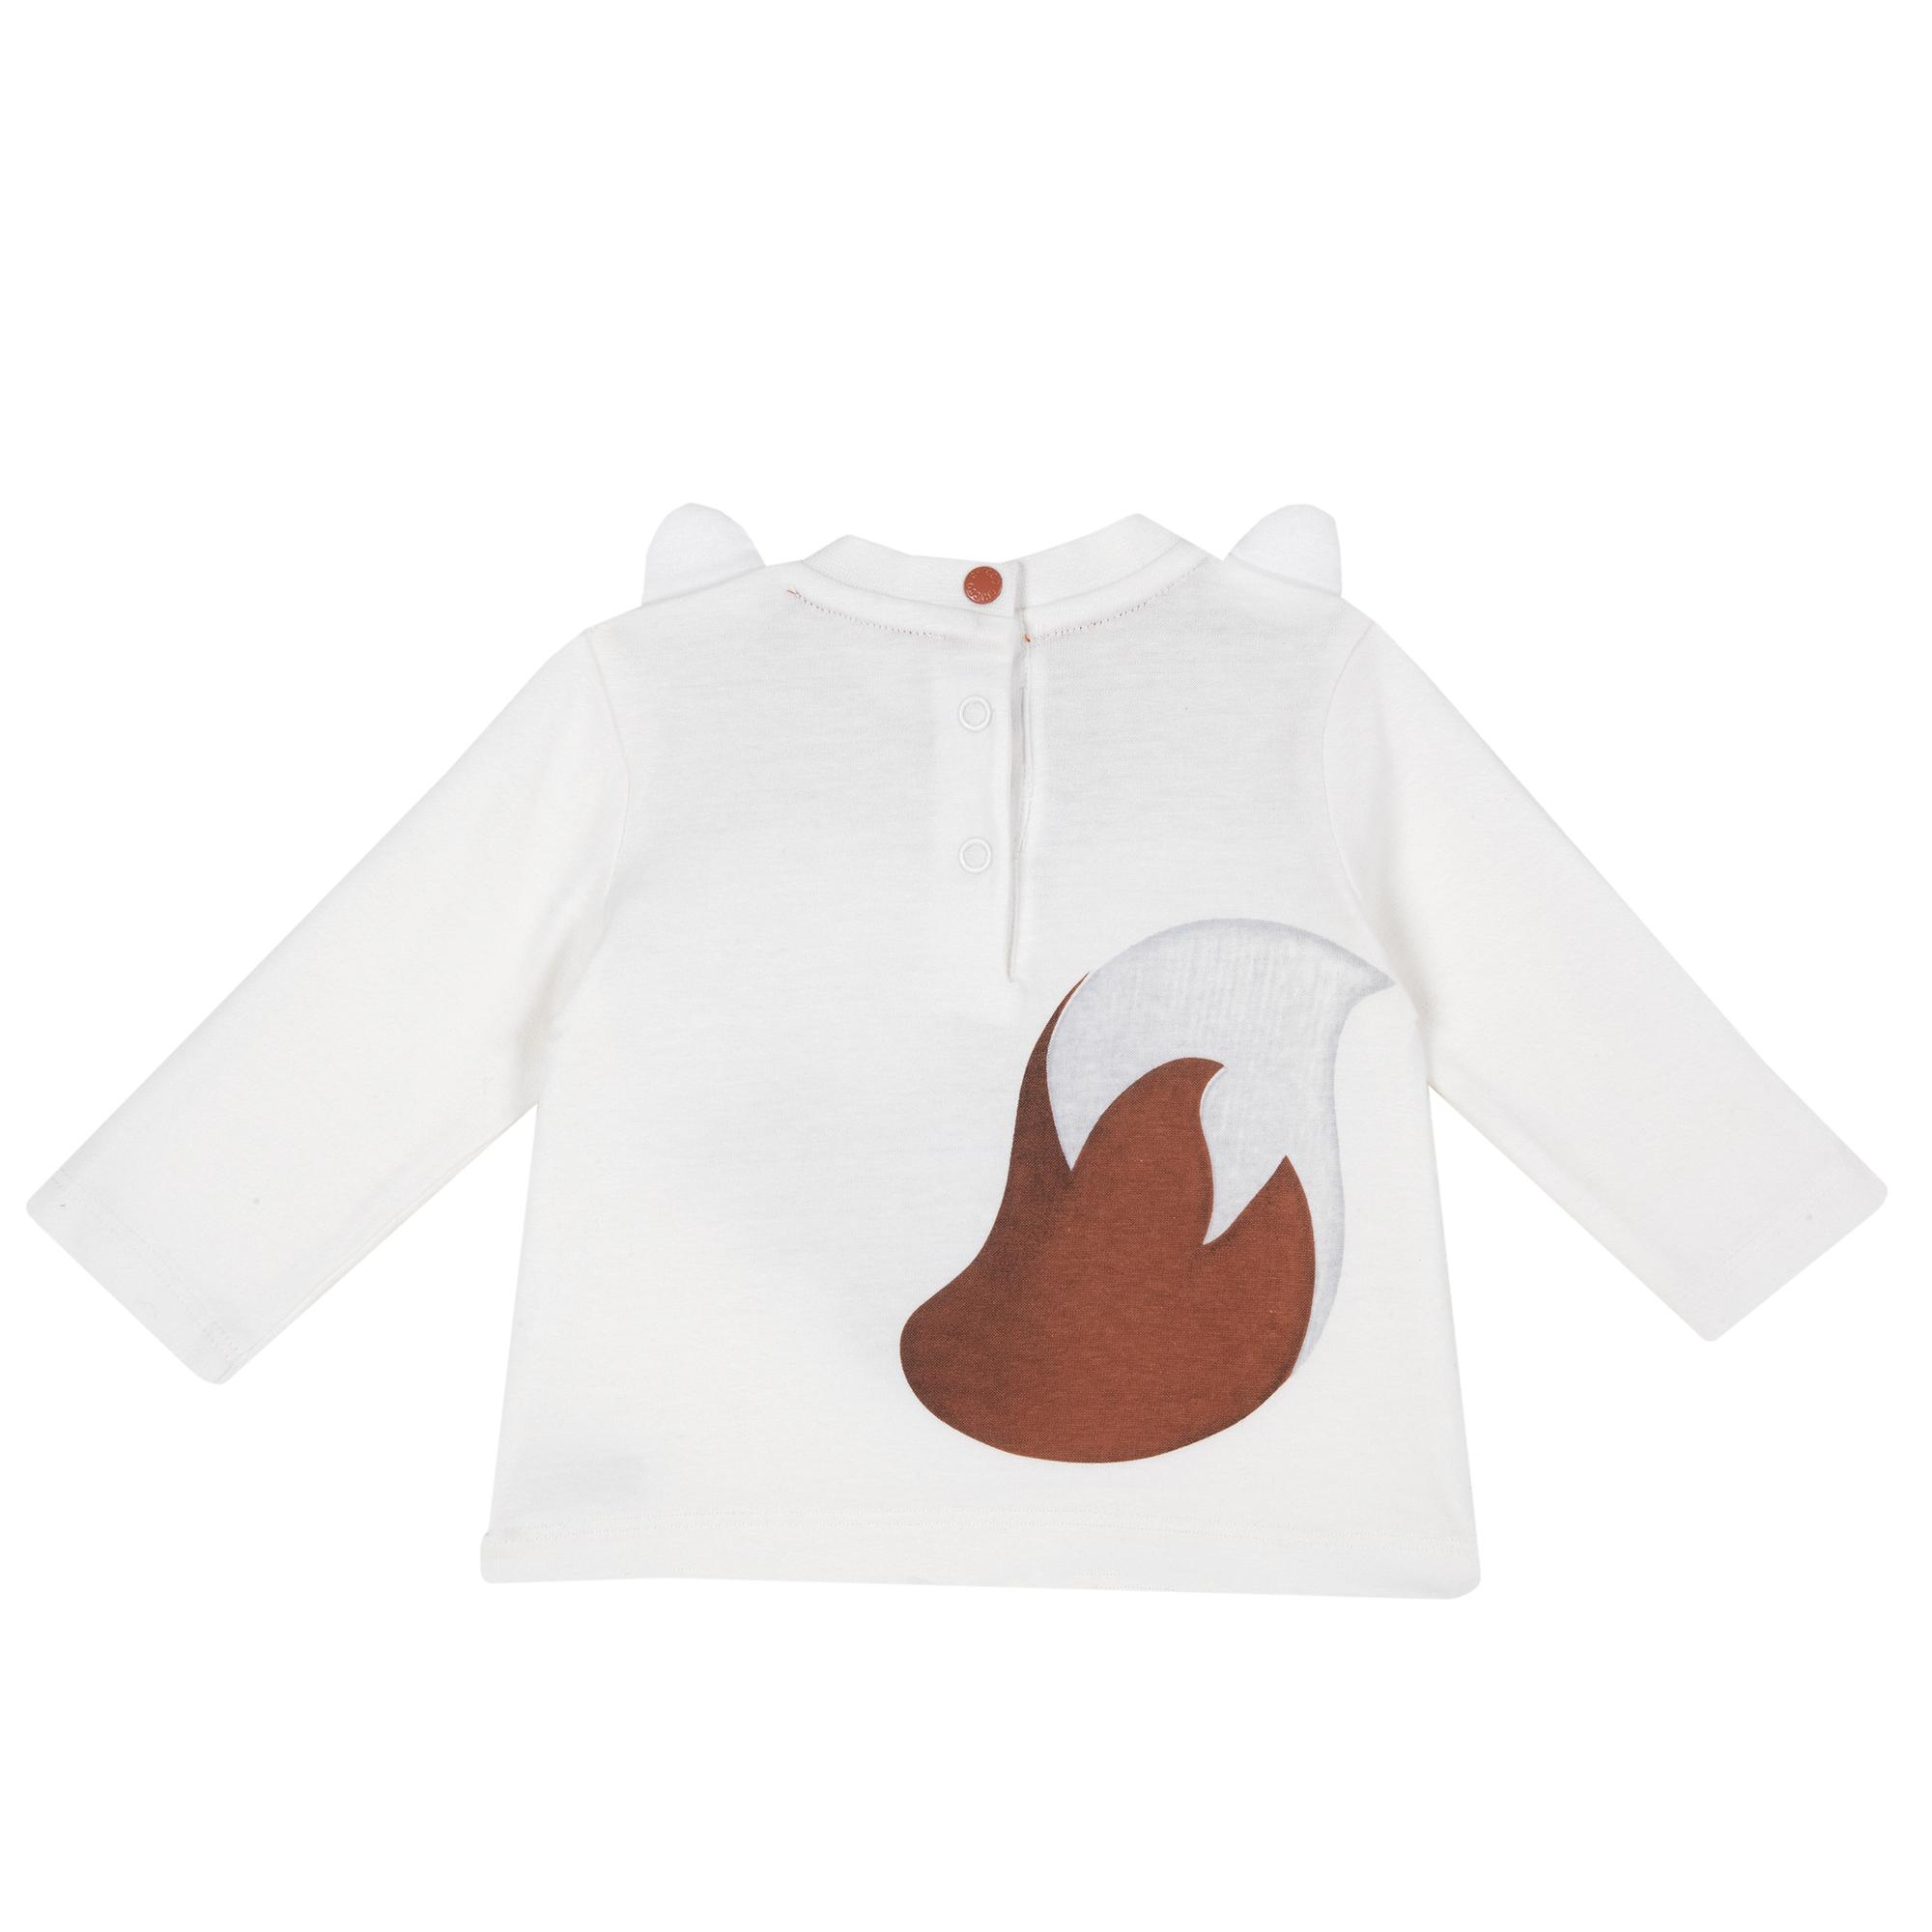 Bluza Copii Chicco, Alb Cu Model, 06157 imagine